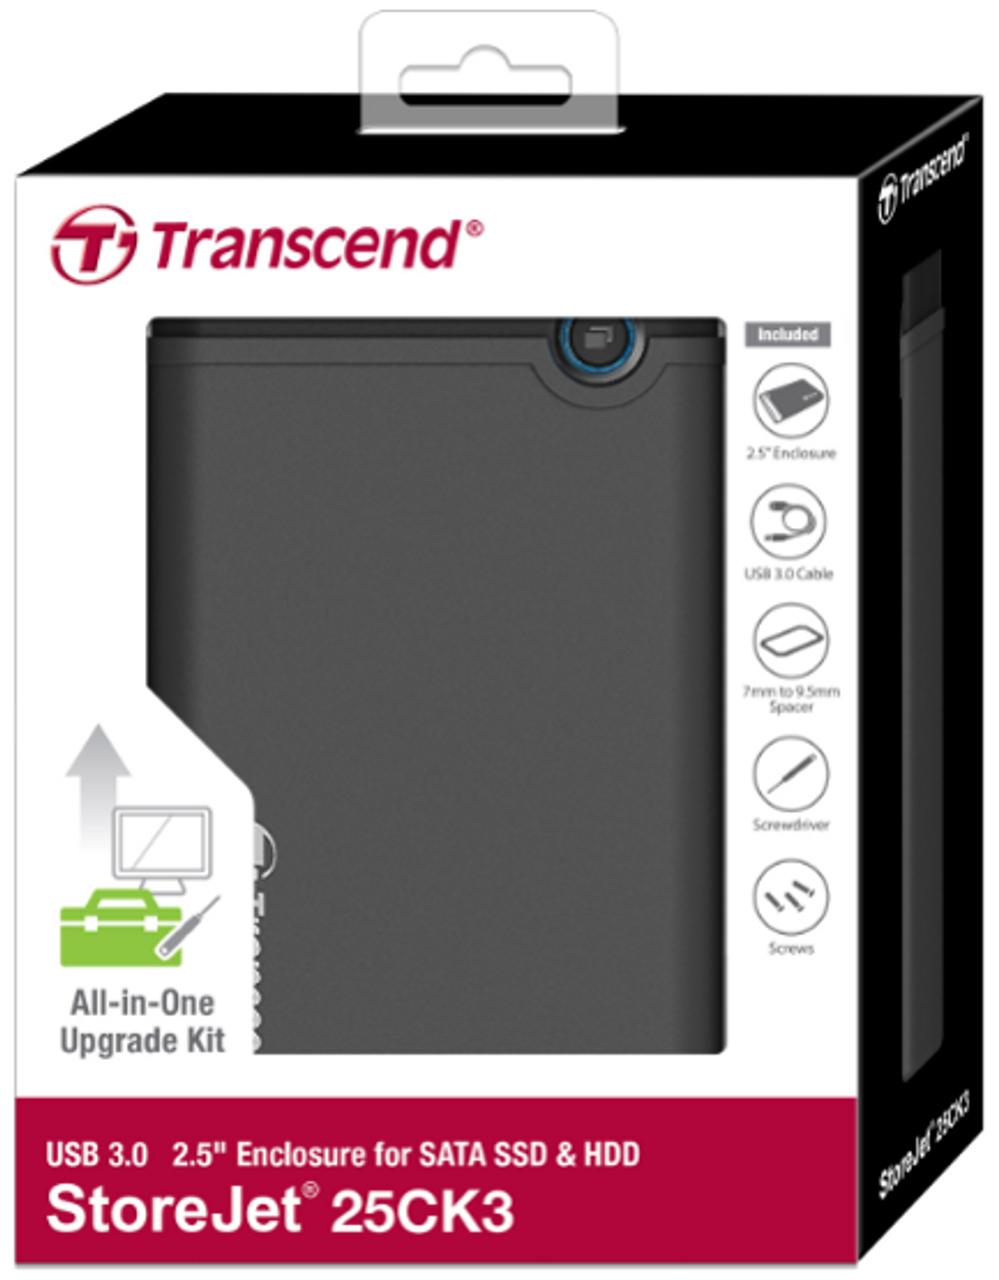 Transcend Portable Storage for PC or laptop , SSD/HDD Upgrade Kit (SJ25CK3)